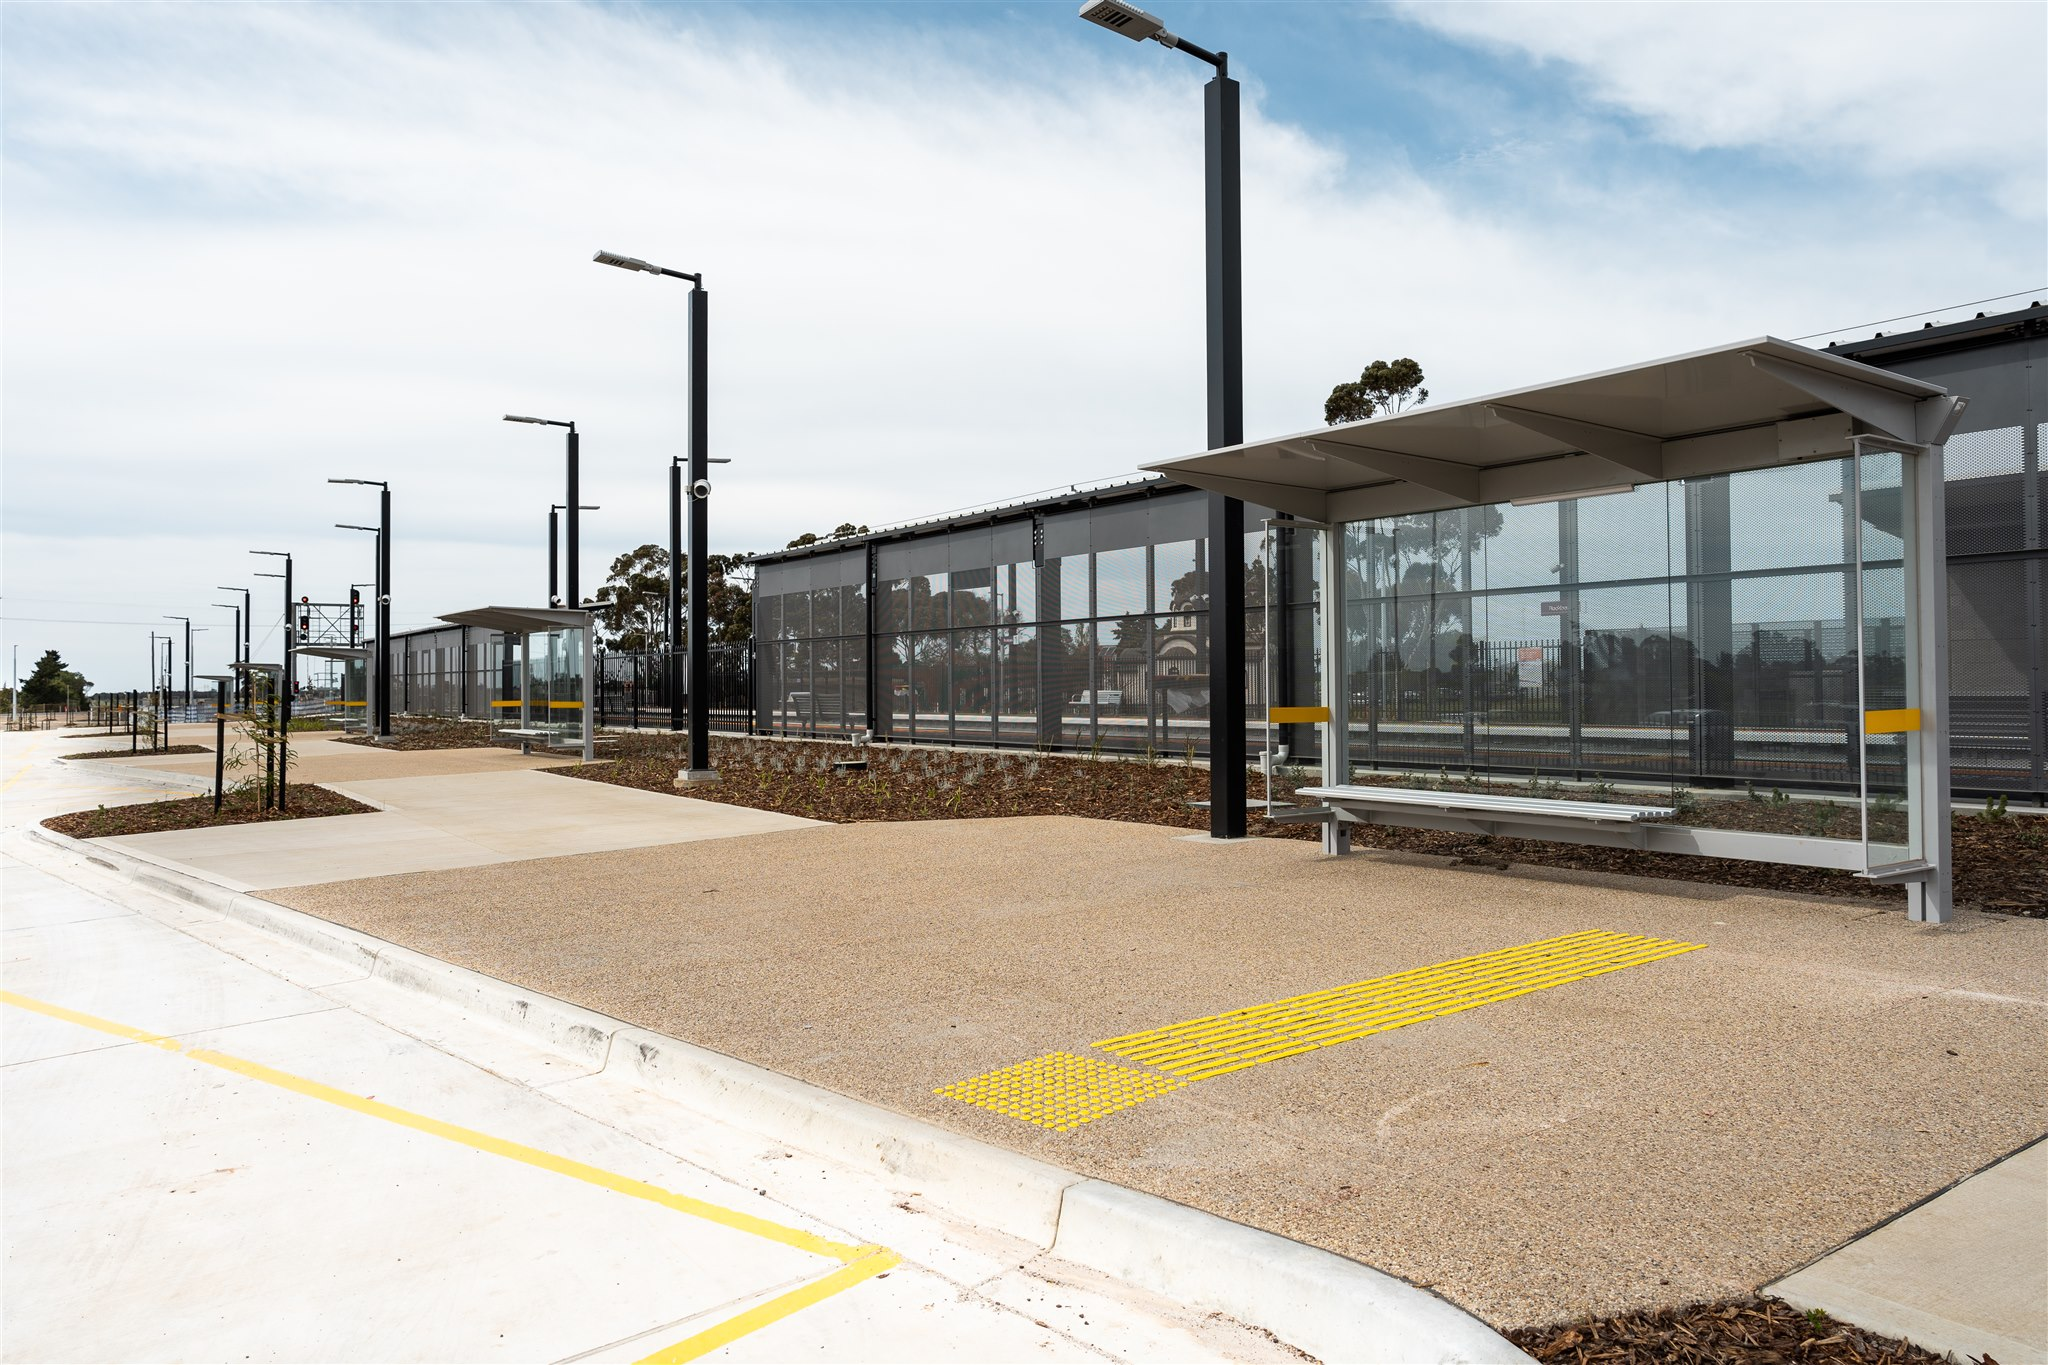 Monero Constructions / Rockbank Train Station